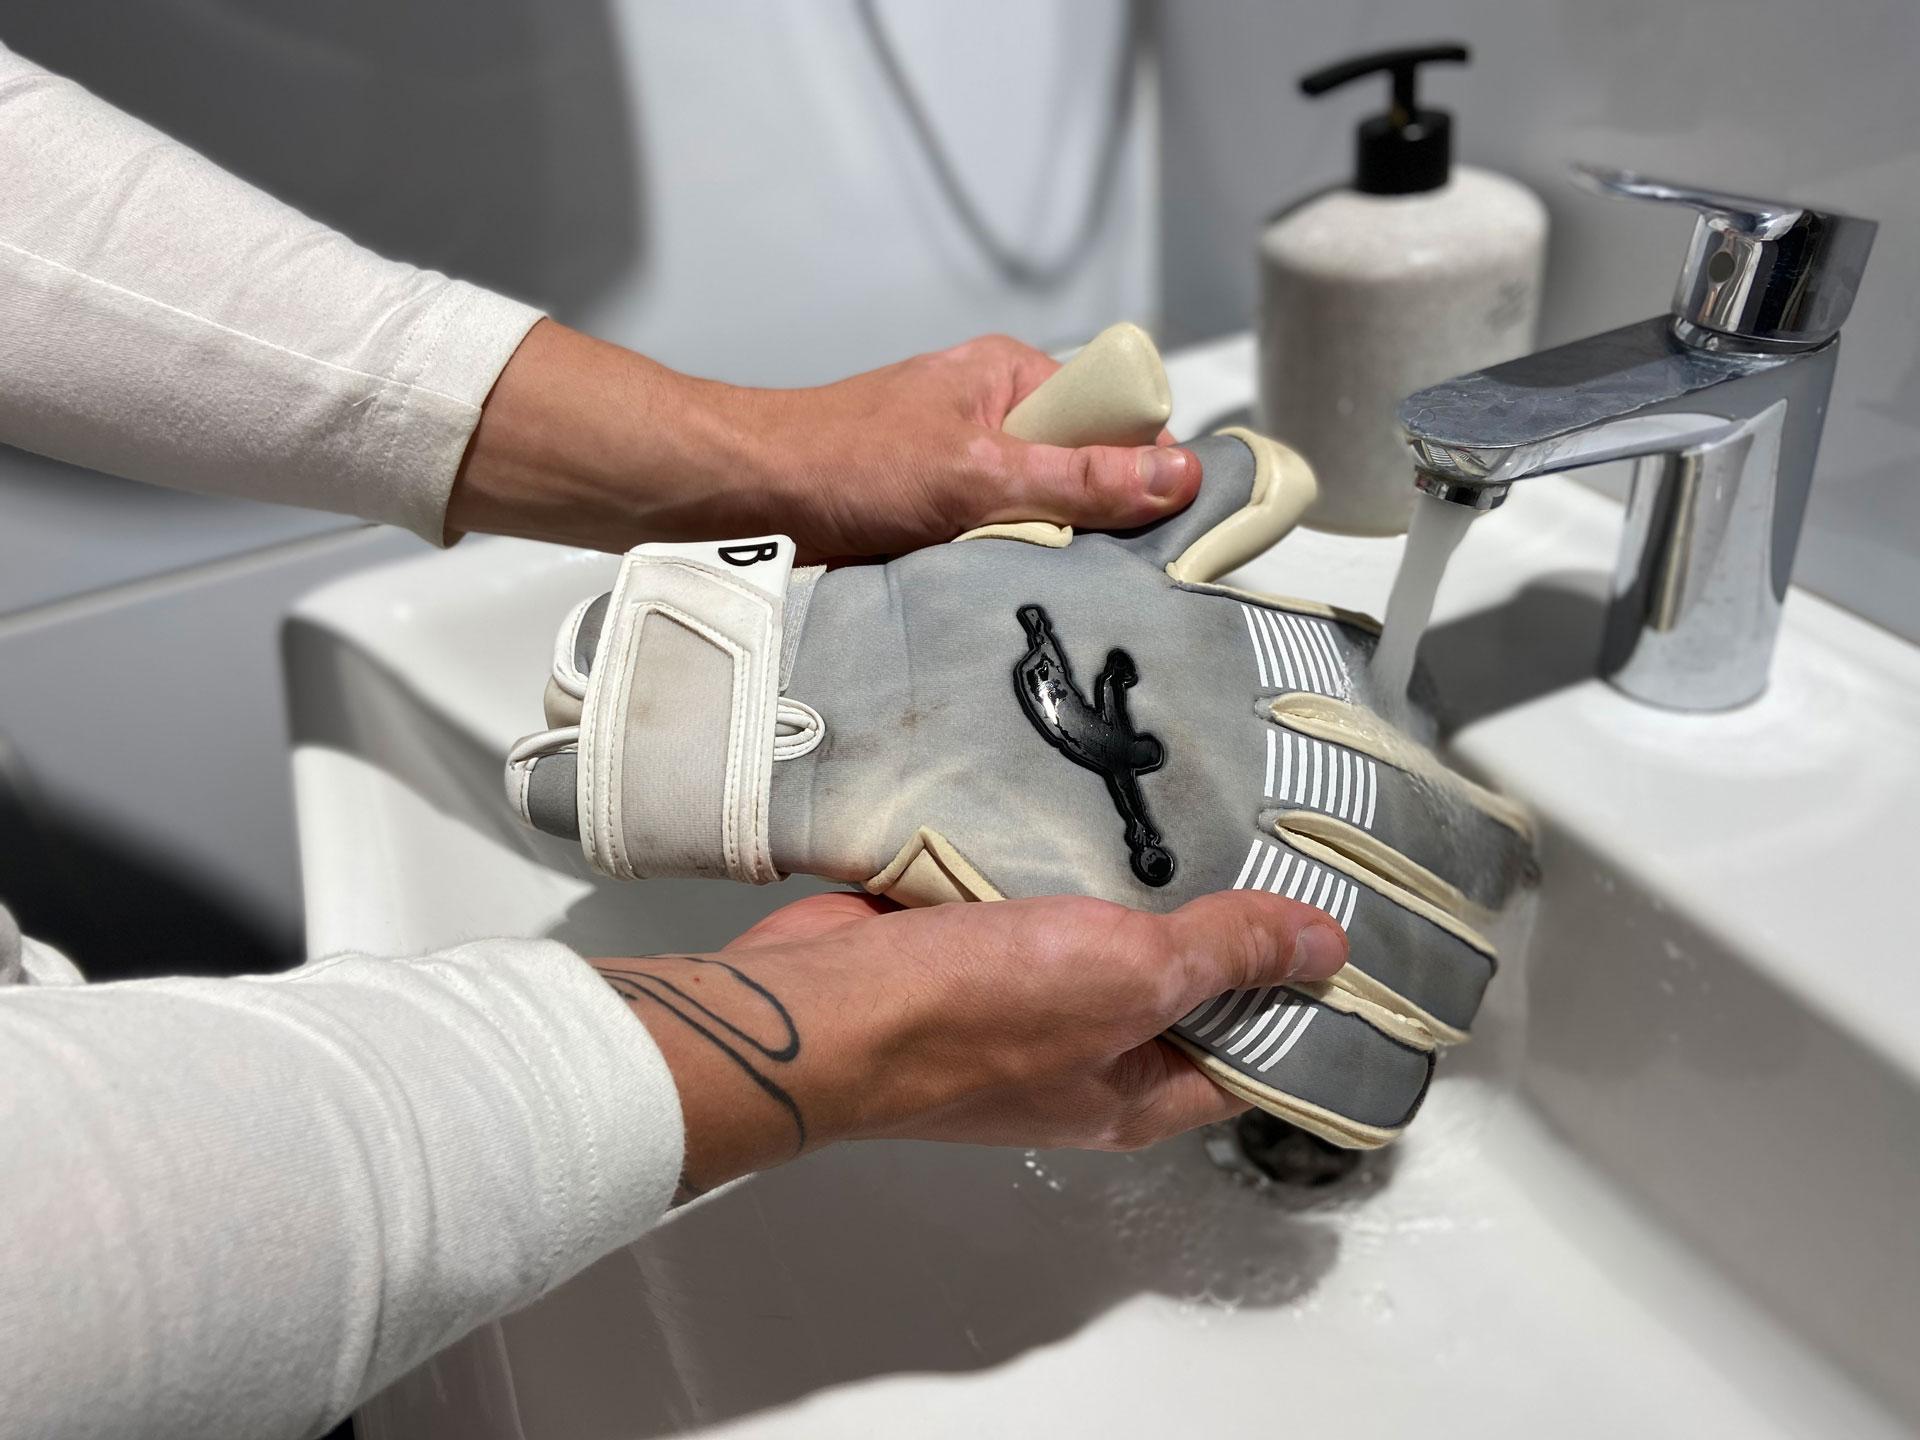 Brave GK Catalyst Grey засоби для захисту рукавиць інтернет магазин Brave GK